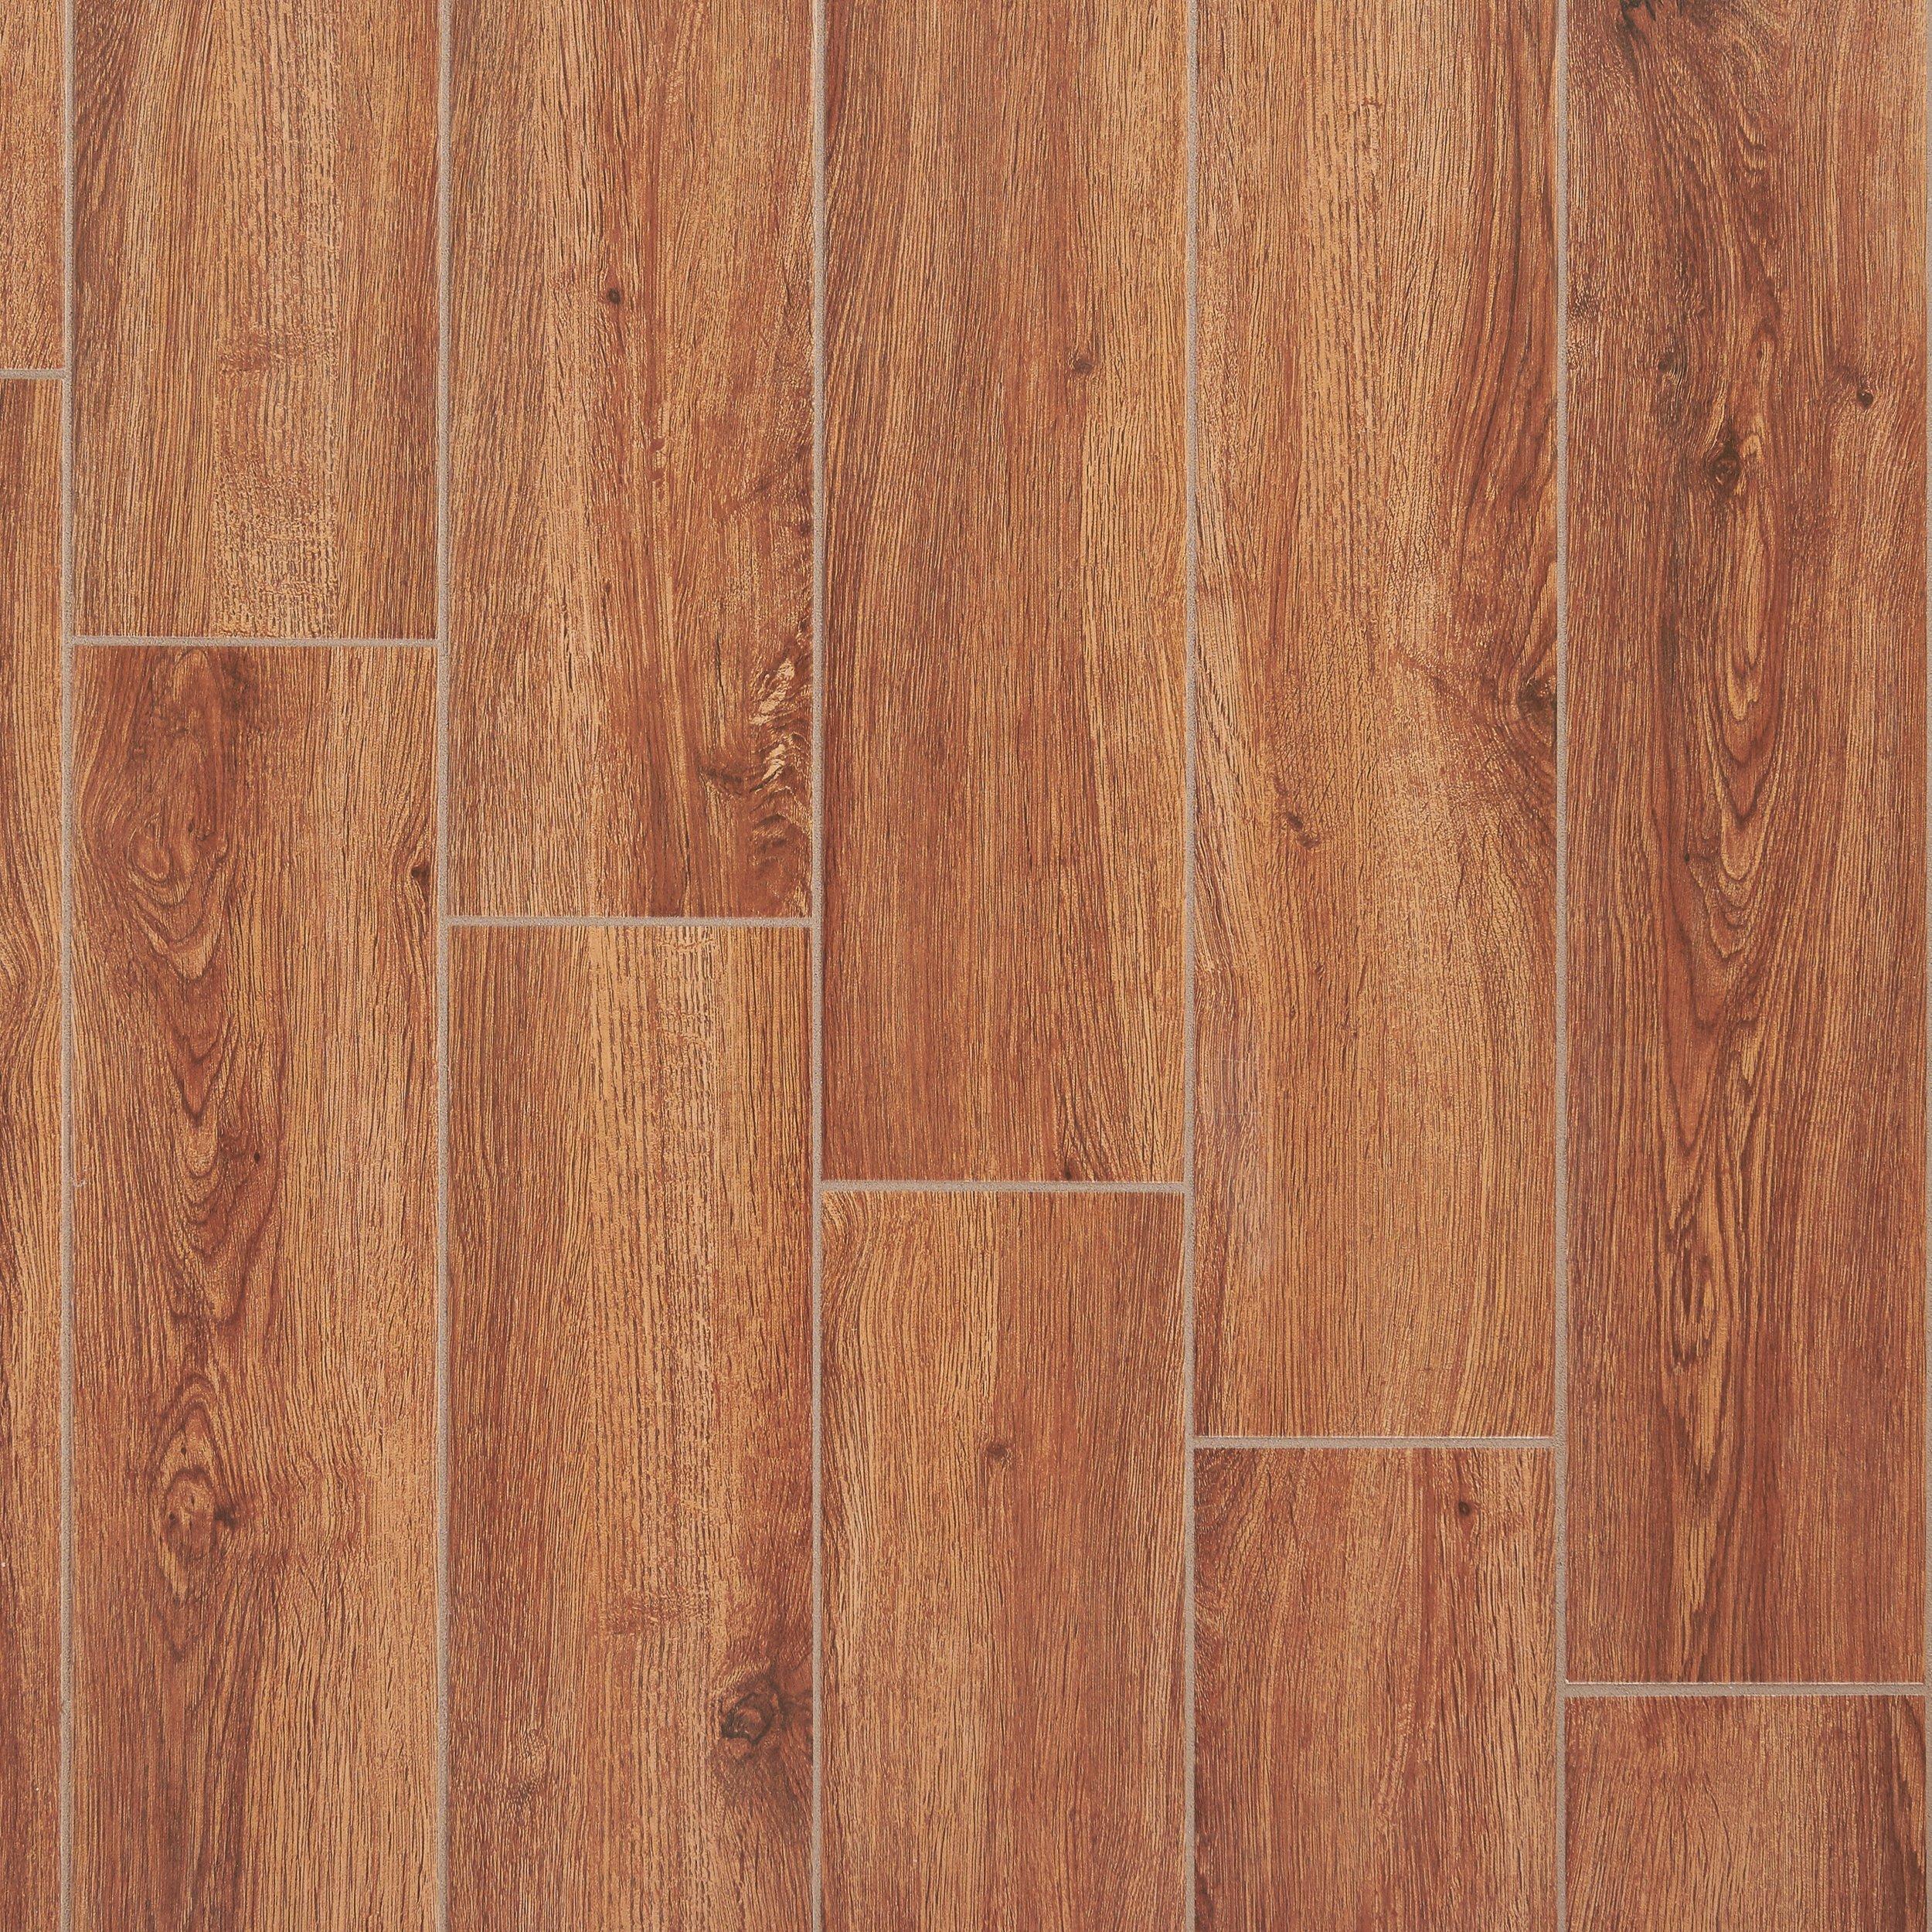 Brighton Natural Wood Plank Ceramic Tile 7 X 20 100191287